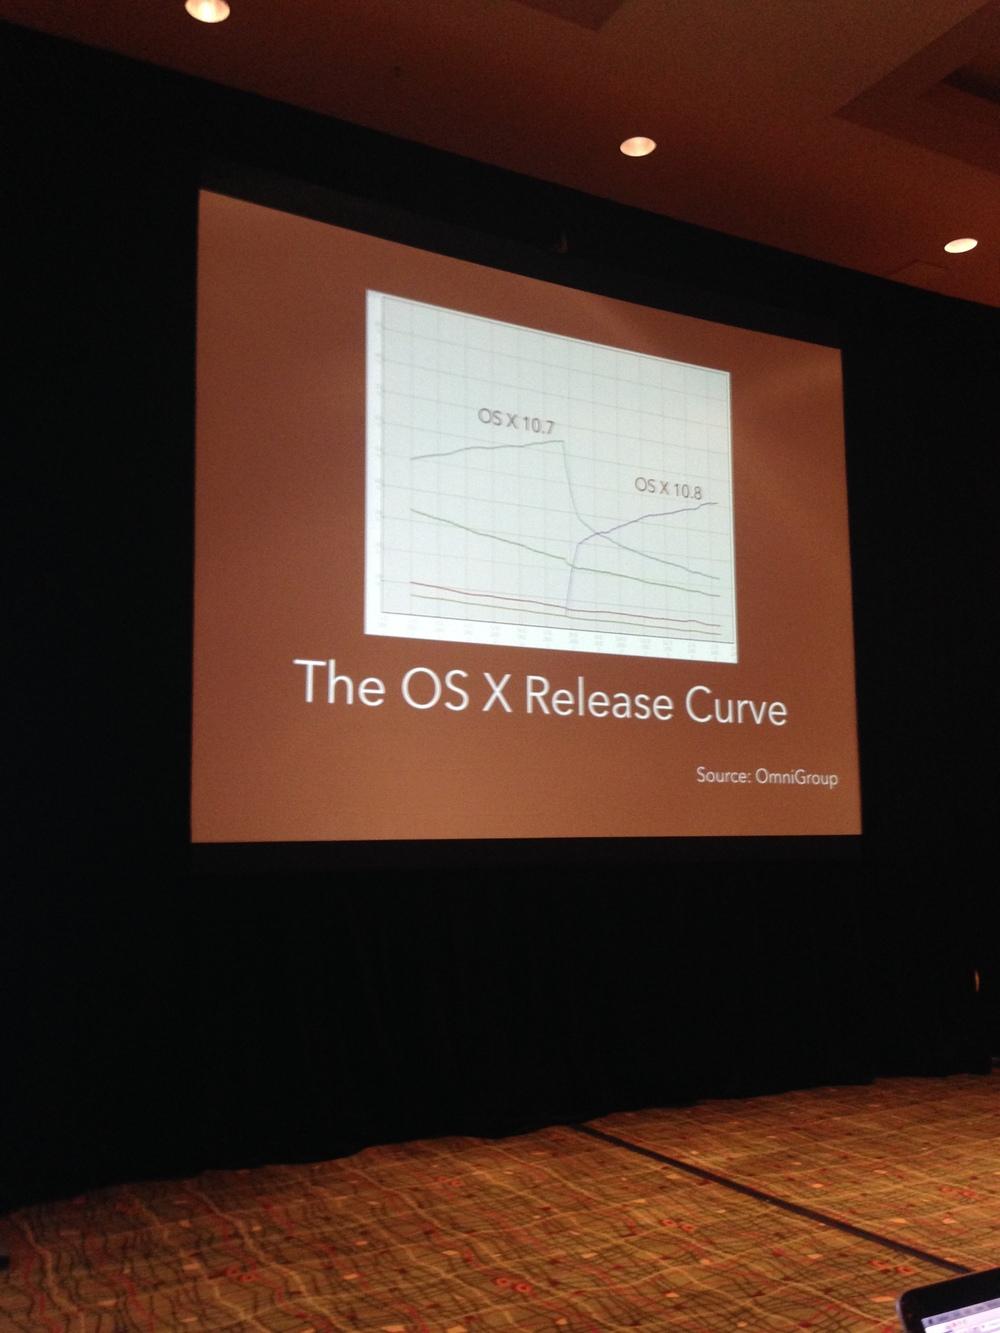 Michael Lynn's keynote